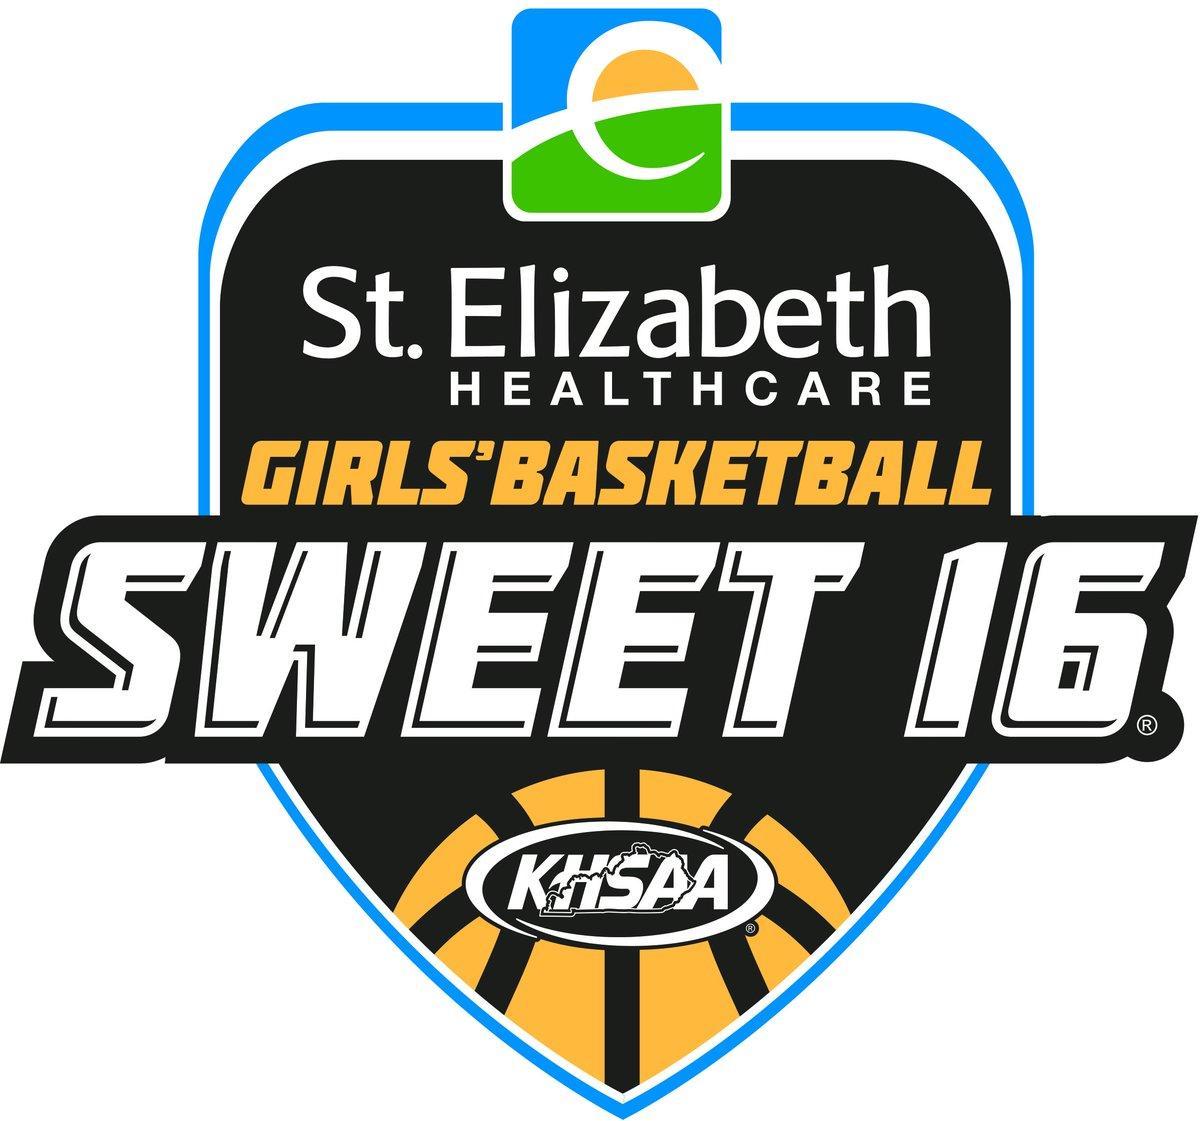 Girls Sweet 16 begins today